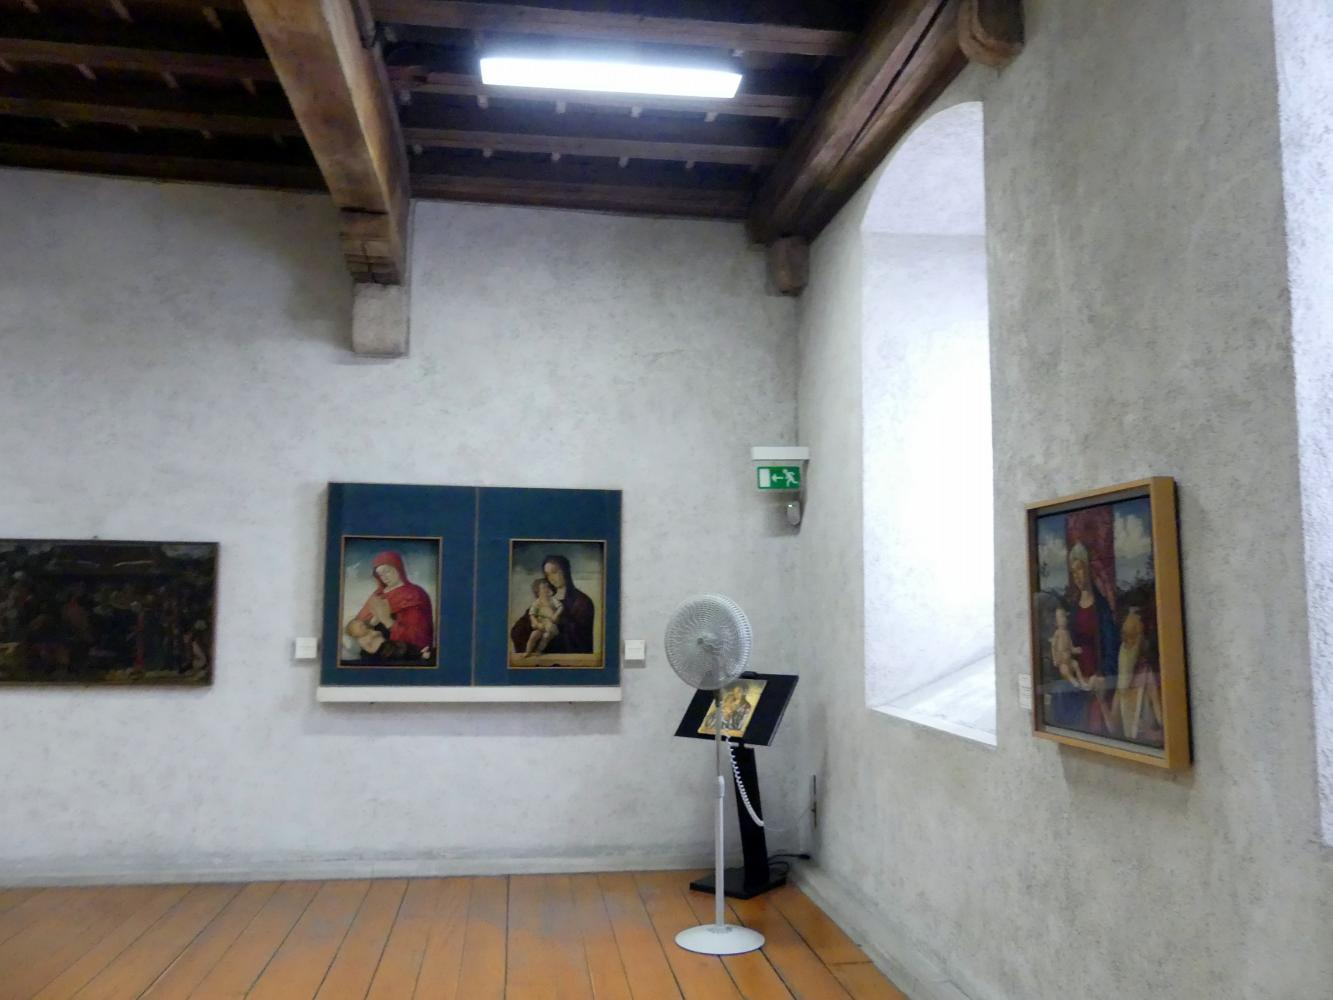 Verona, Museo di Castelvecchio, Saal 13, Bild 2/3